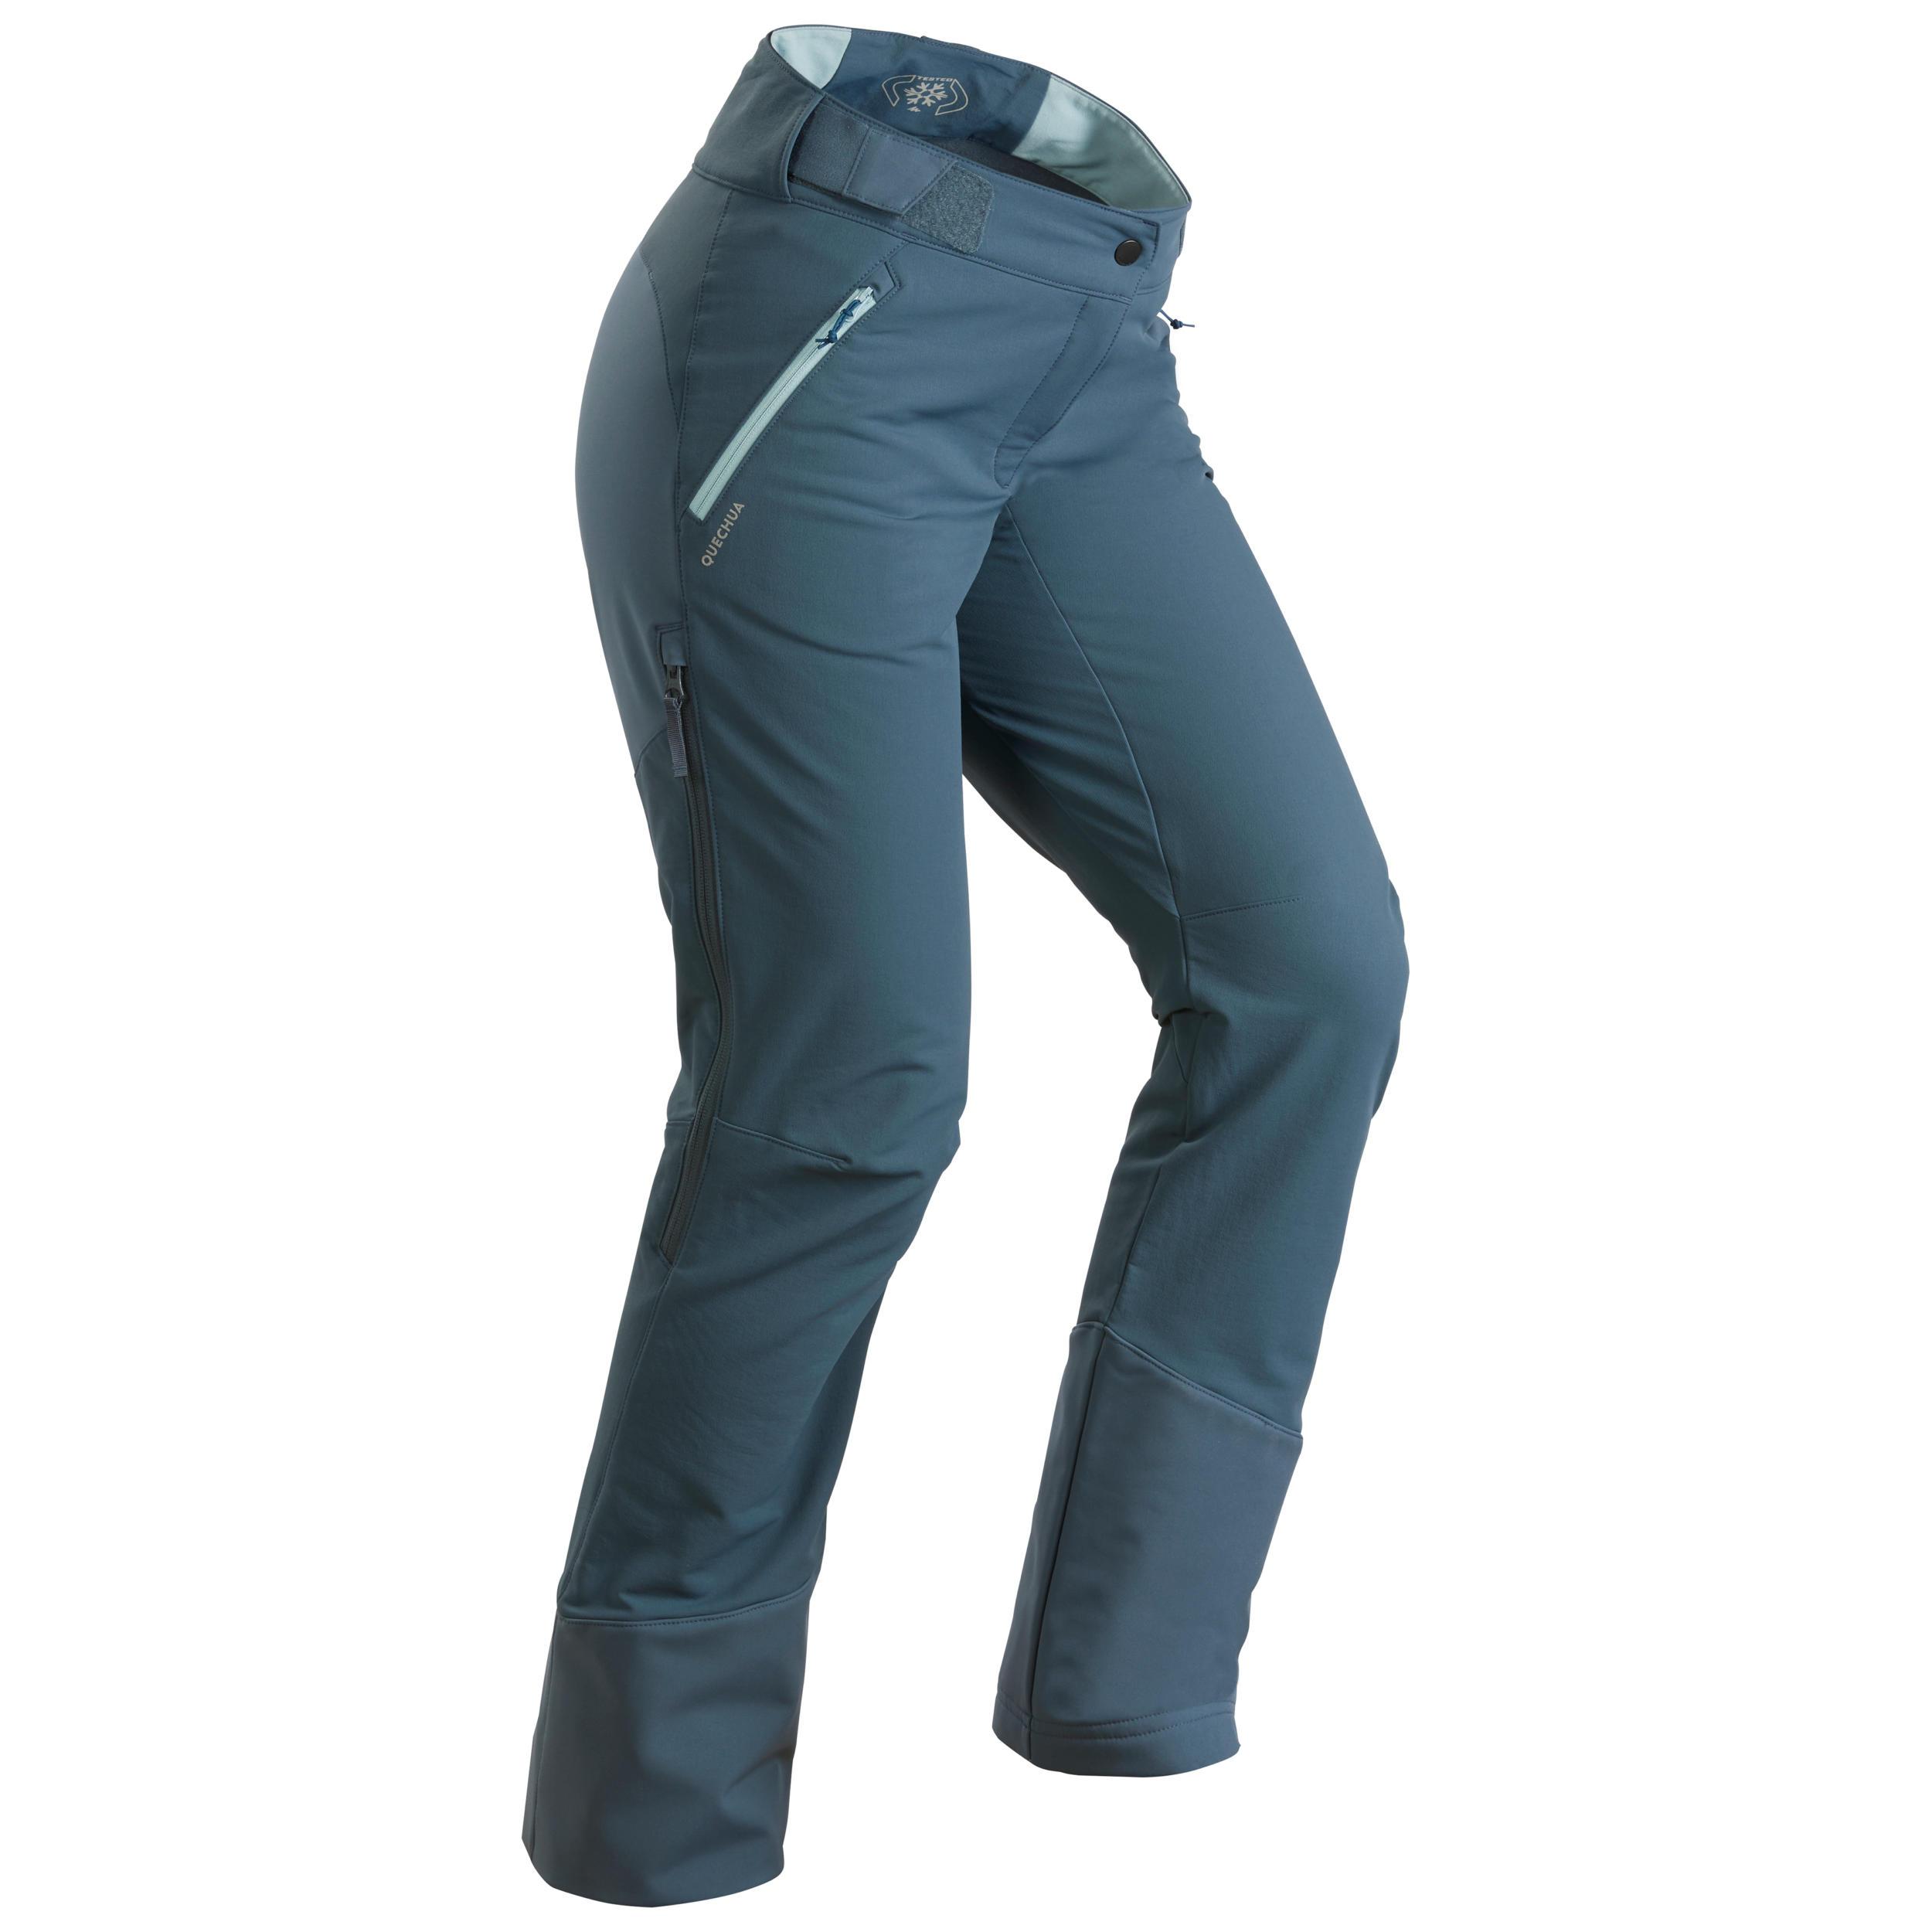 Wanderhose Winterwandern SH520 Extra-Warm Damen graublau